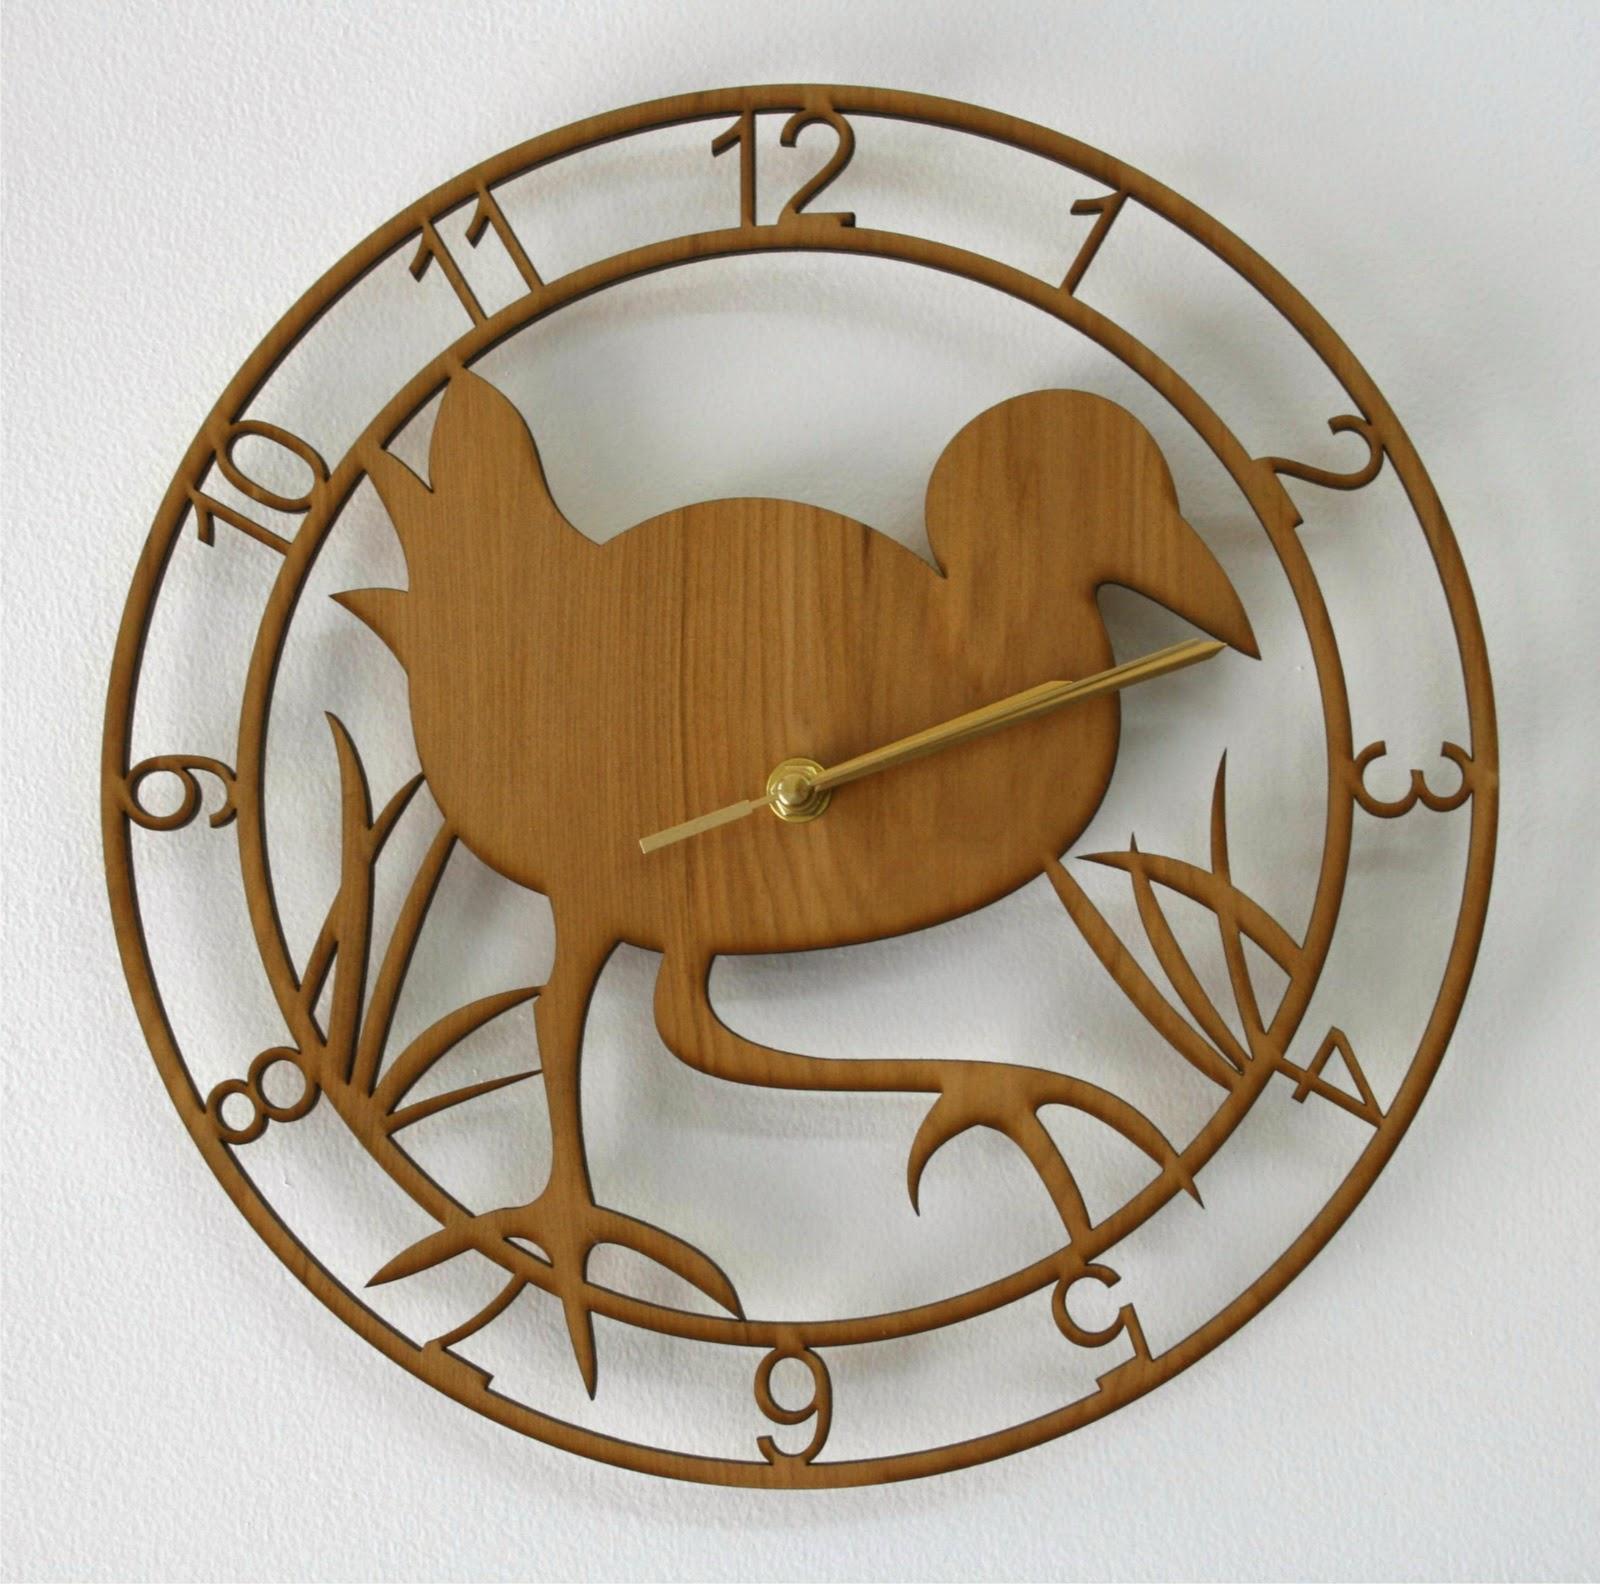 http://felt.co.nz/listing/144722/Pukeko-clock---rimu-veneer